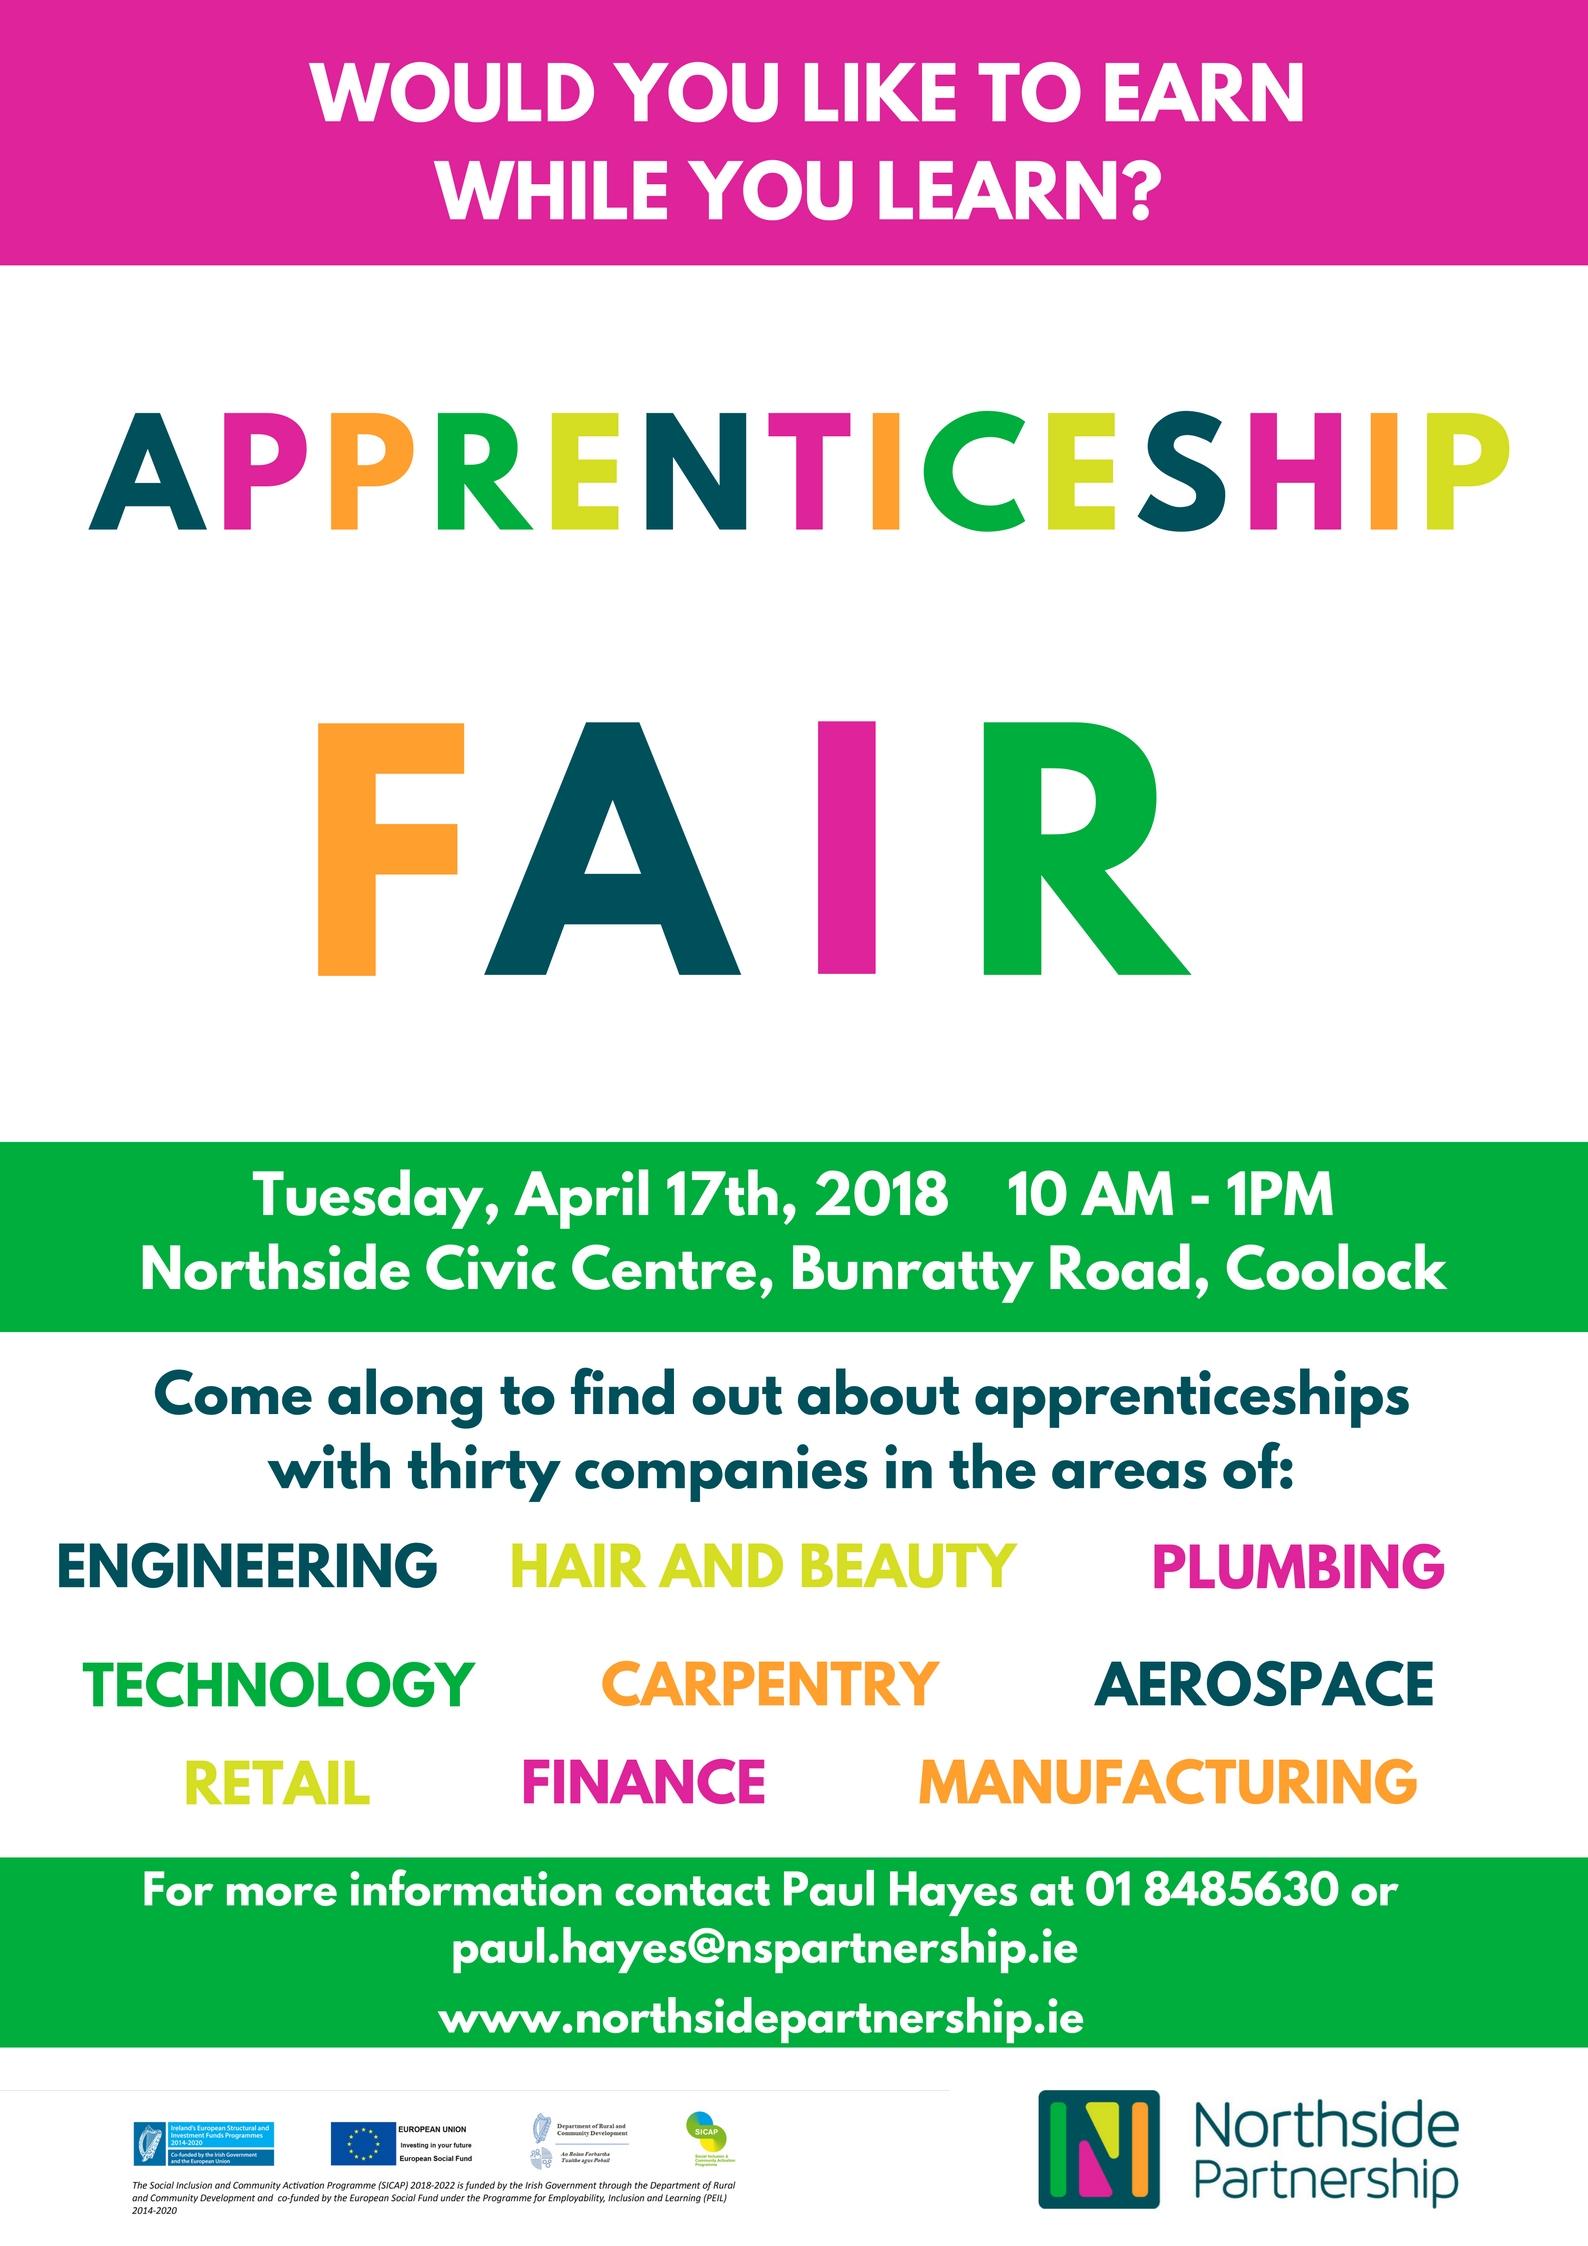 Apprenticeship Fair April 17th!